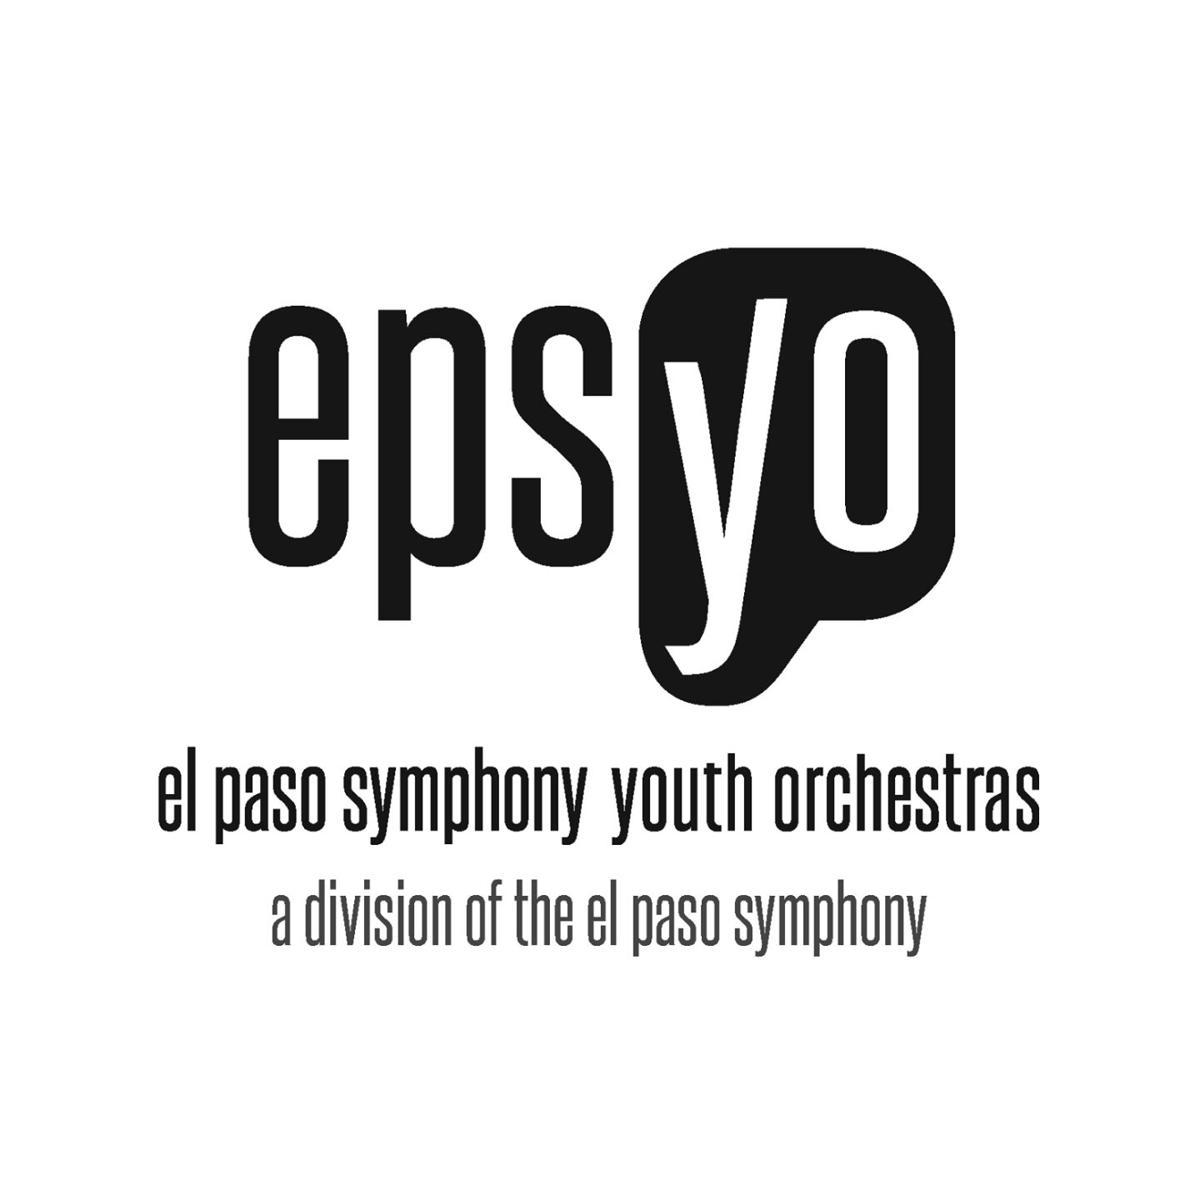 epsyo logo.png